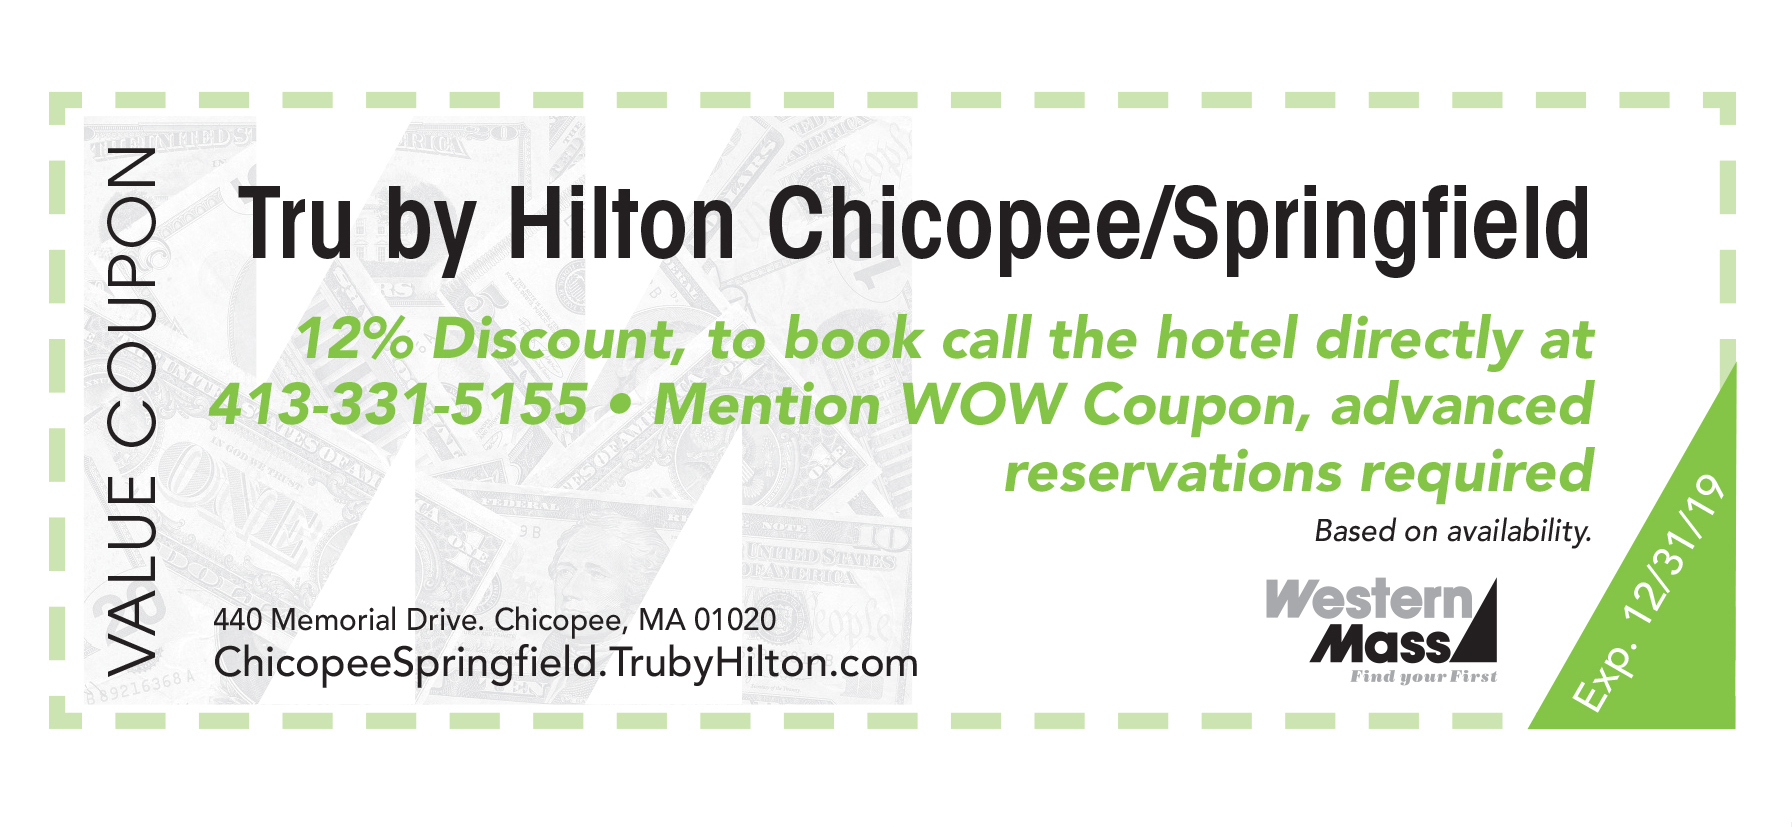 Tru by Hilton Chicopee/Springfield